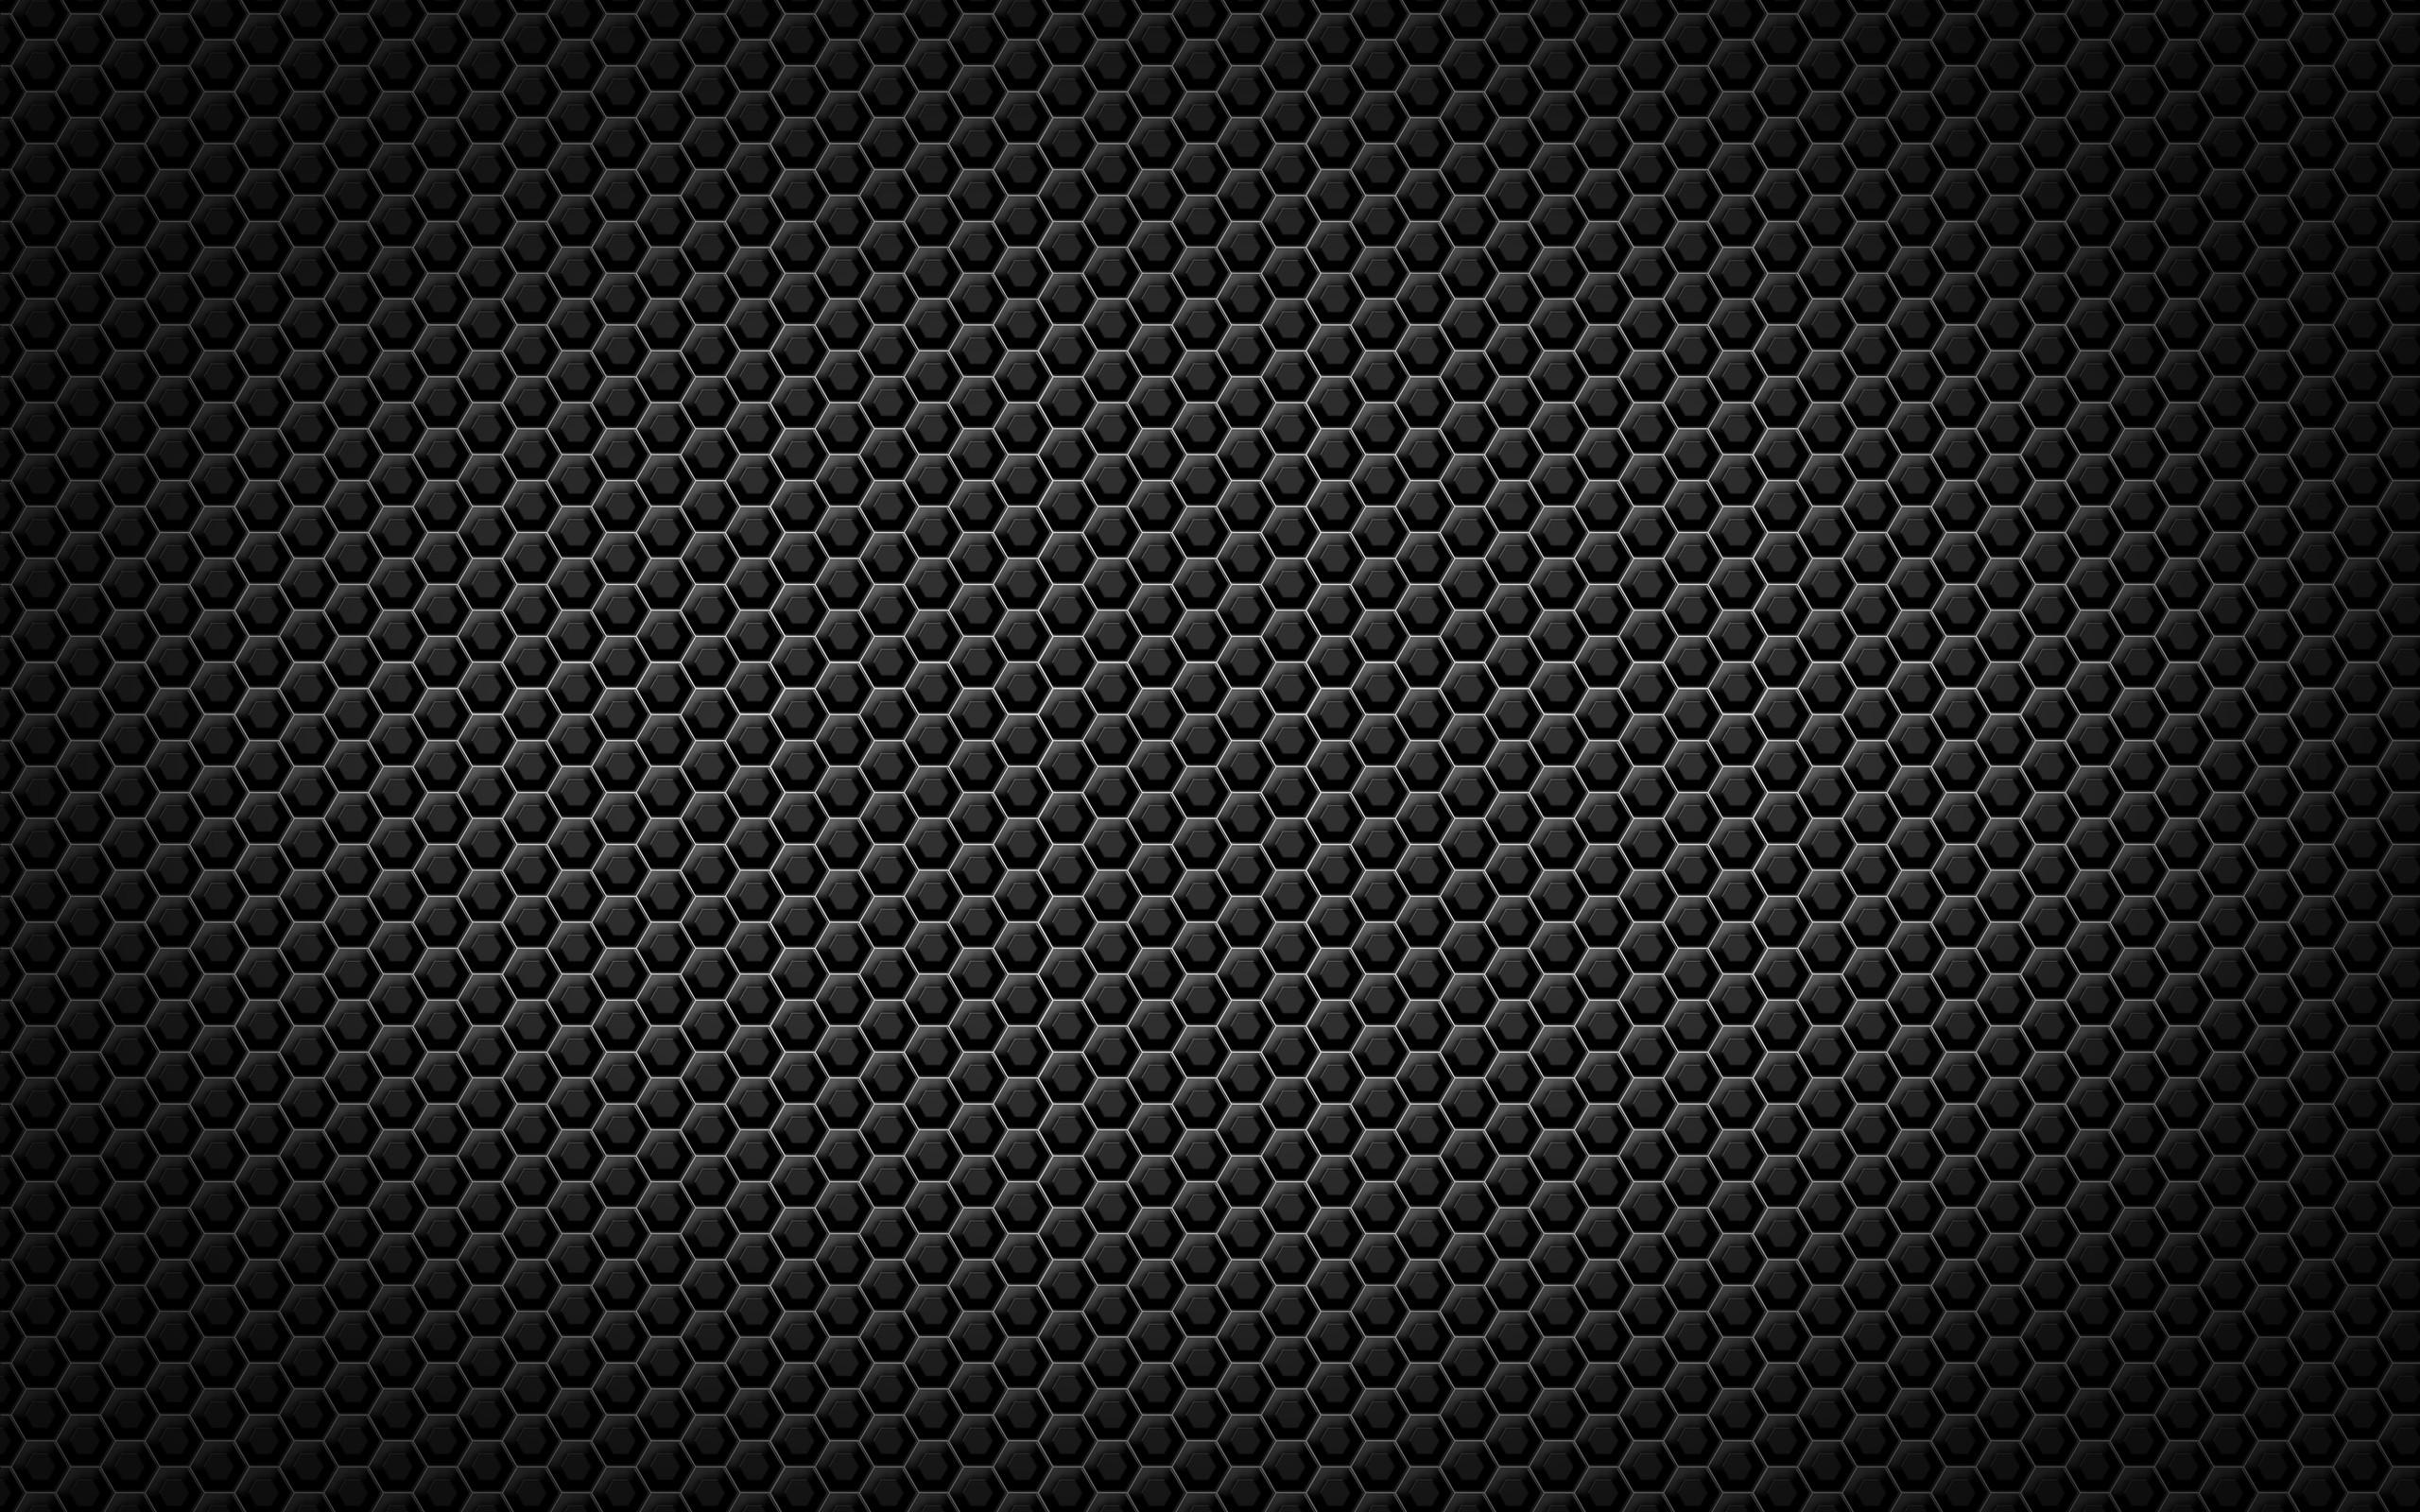 Black Wallpaper Backgrounds Wallpaper Added on , Tagged : Wallpaper  Backgrounds at Forrestkyle Gallery